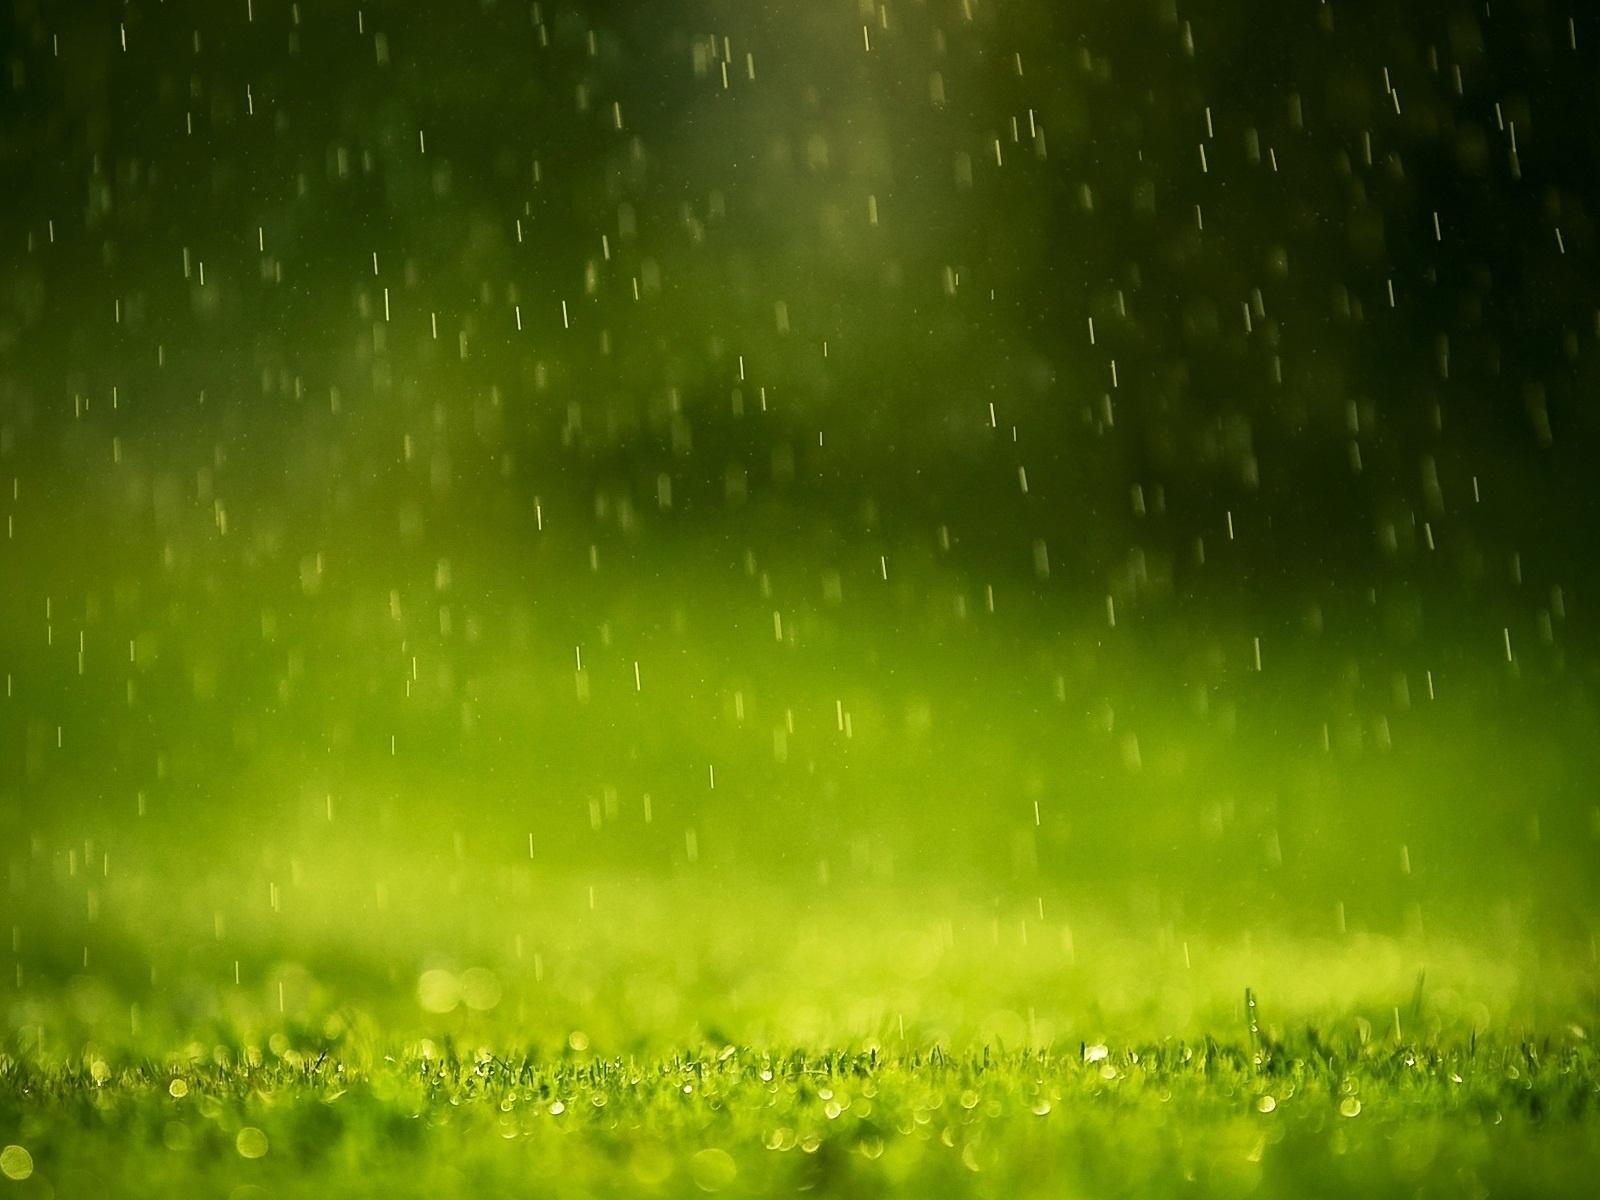 grass macro photography - photo #19